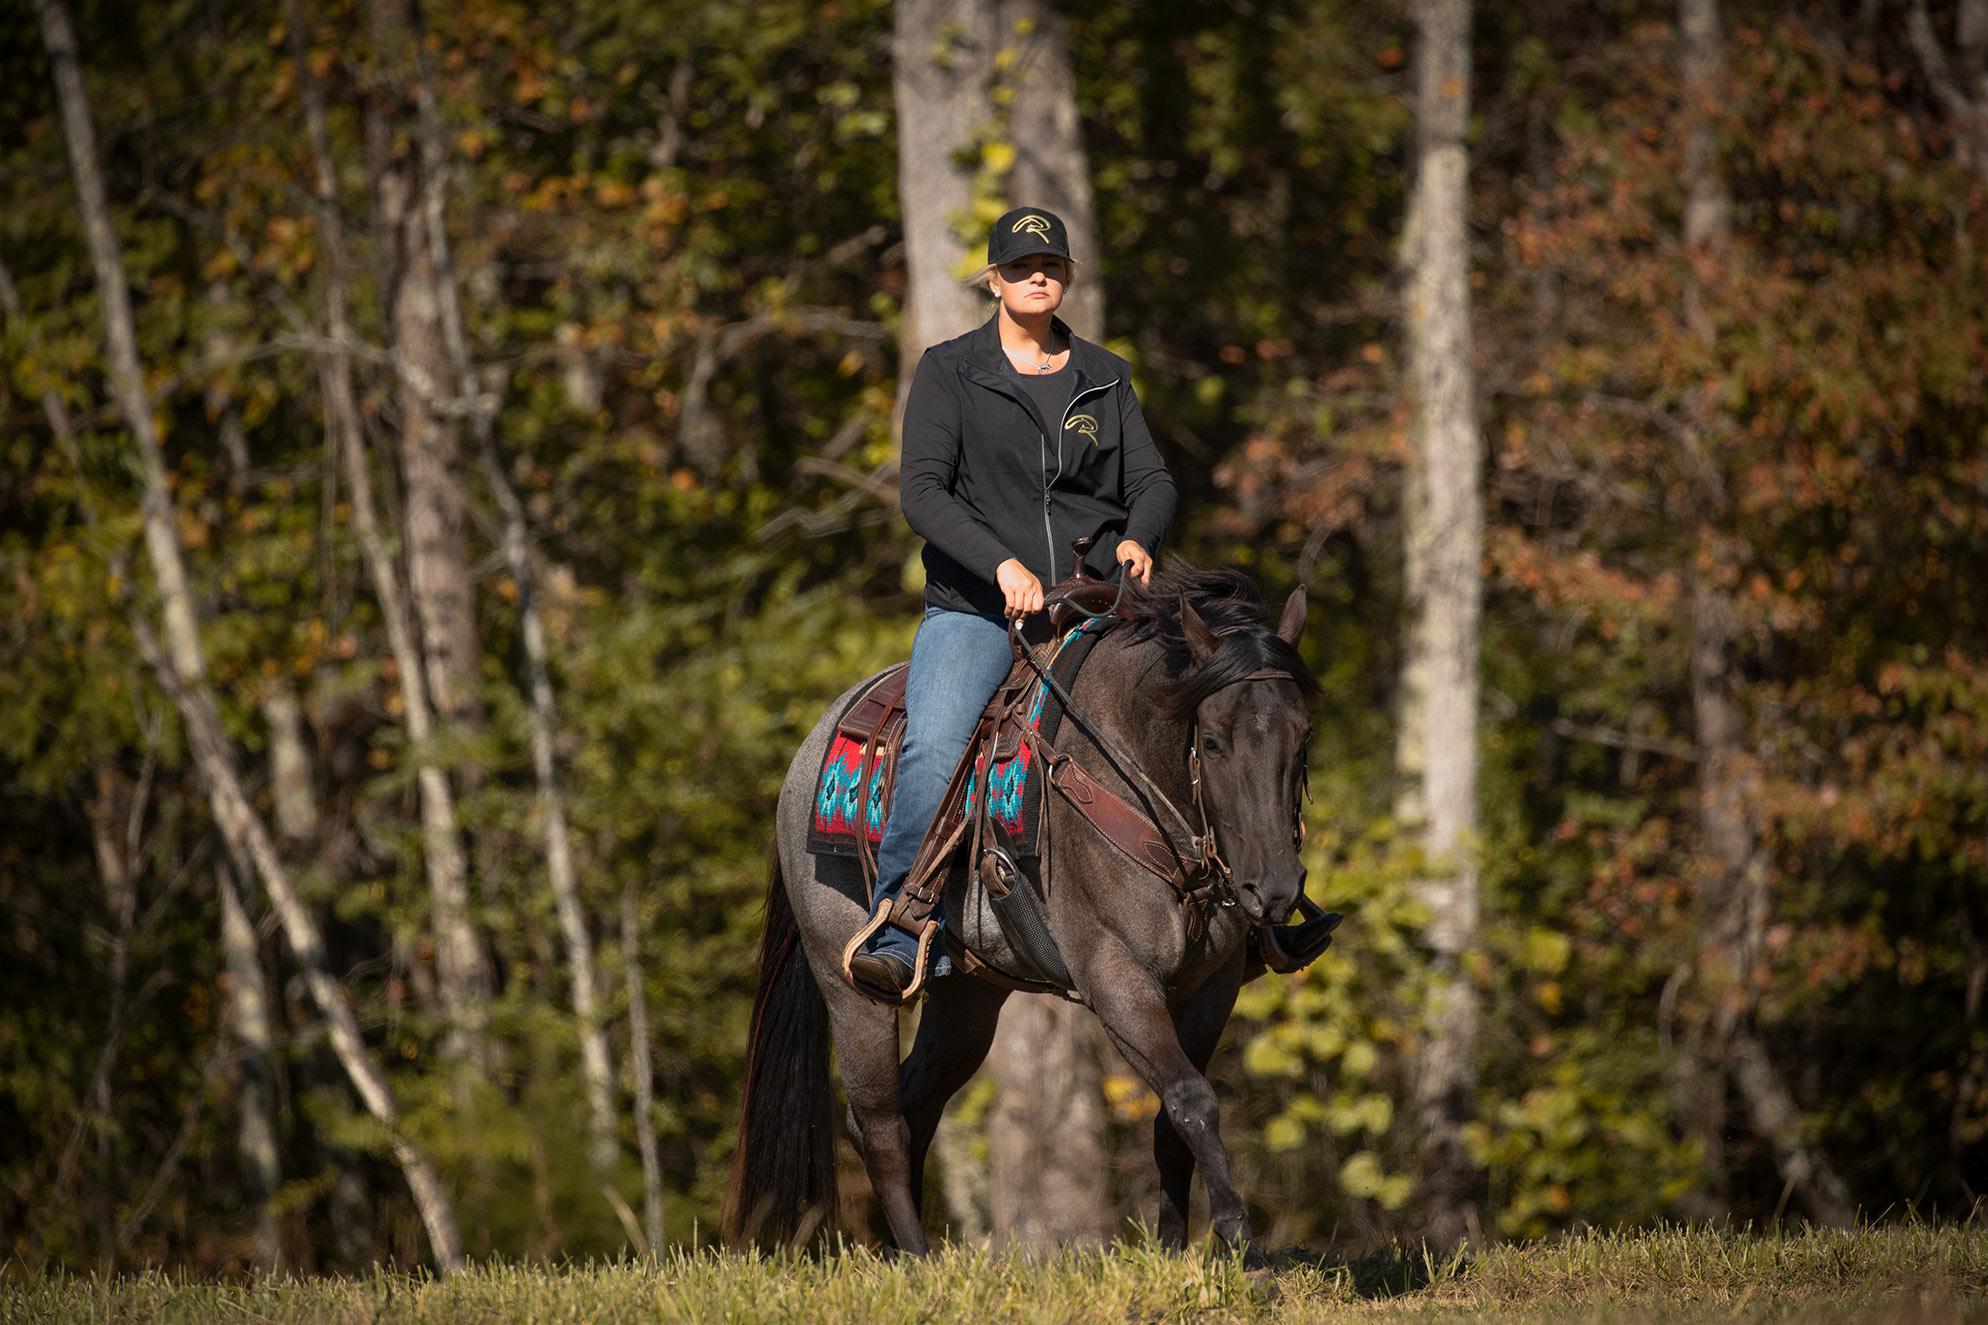 015-Gunsmoke-Luxury-Trail-Horse-For-Sale